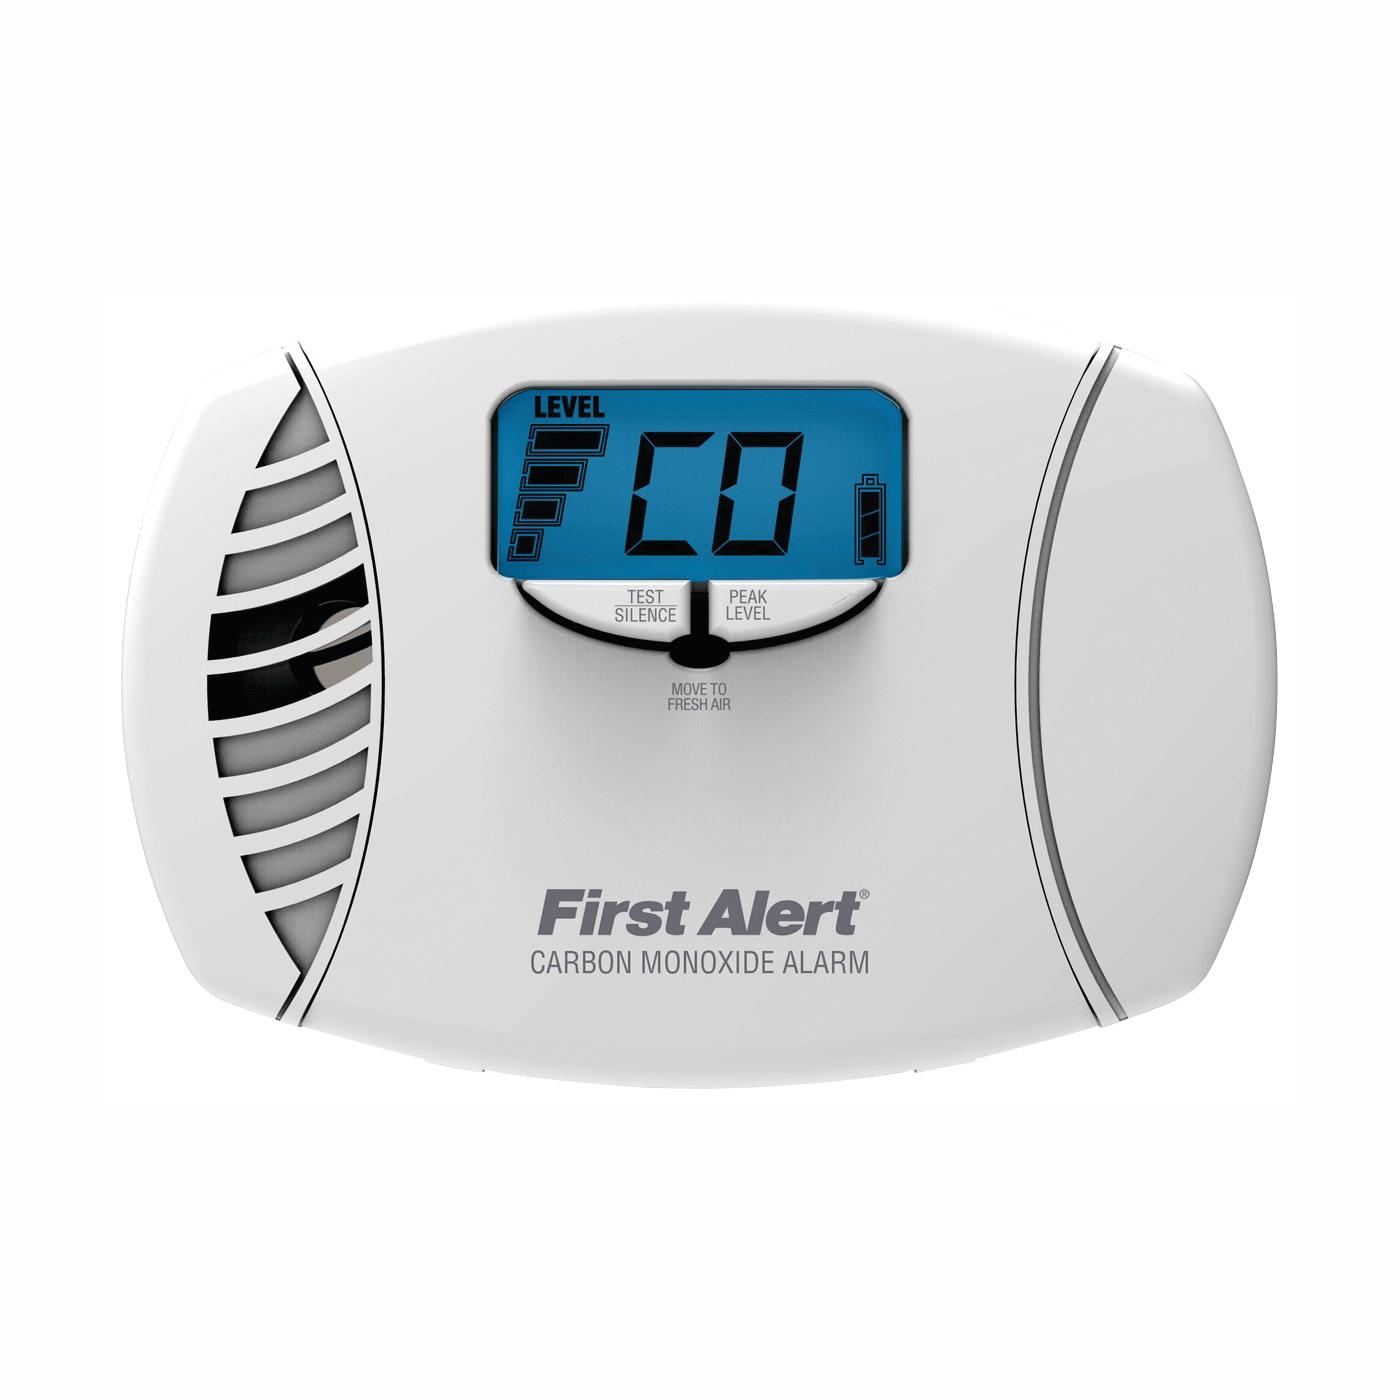 Picture of FIRST ALERT CO615 Carbon Monoxide Alarm, 10 ft, Digital Display, 85 dB, Alarm: Audible, Electrochemical Sensor